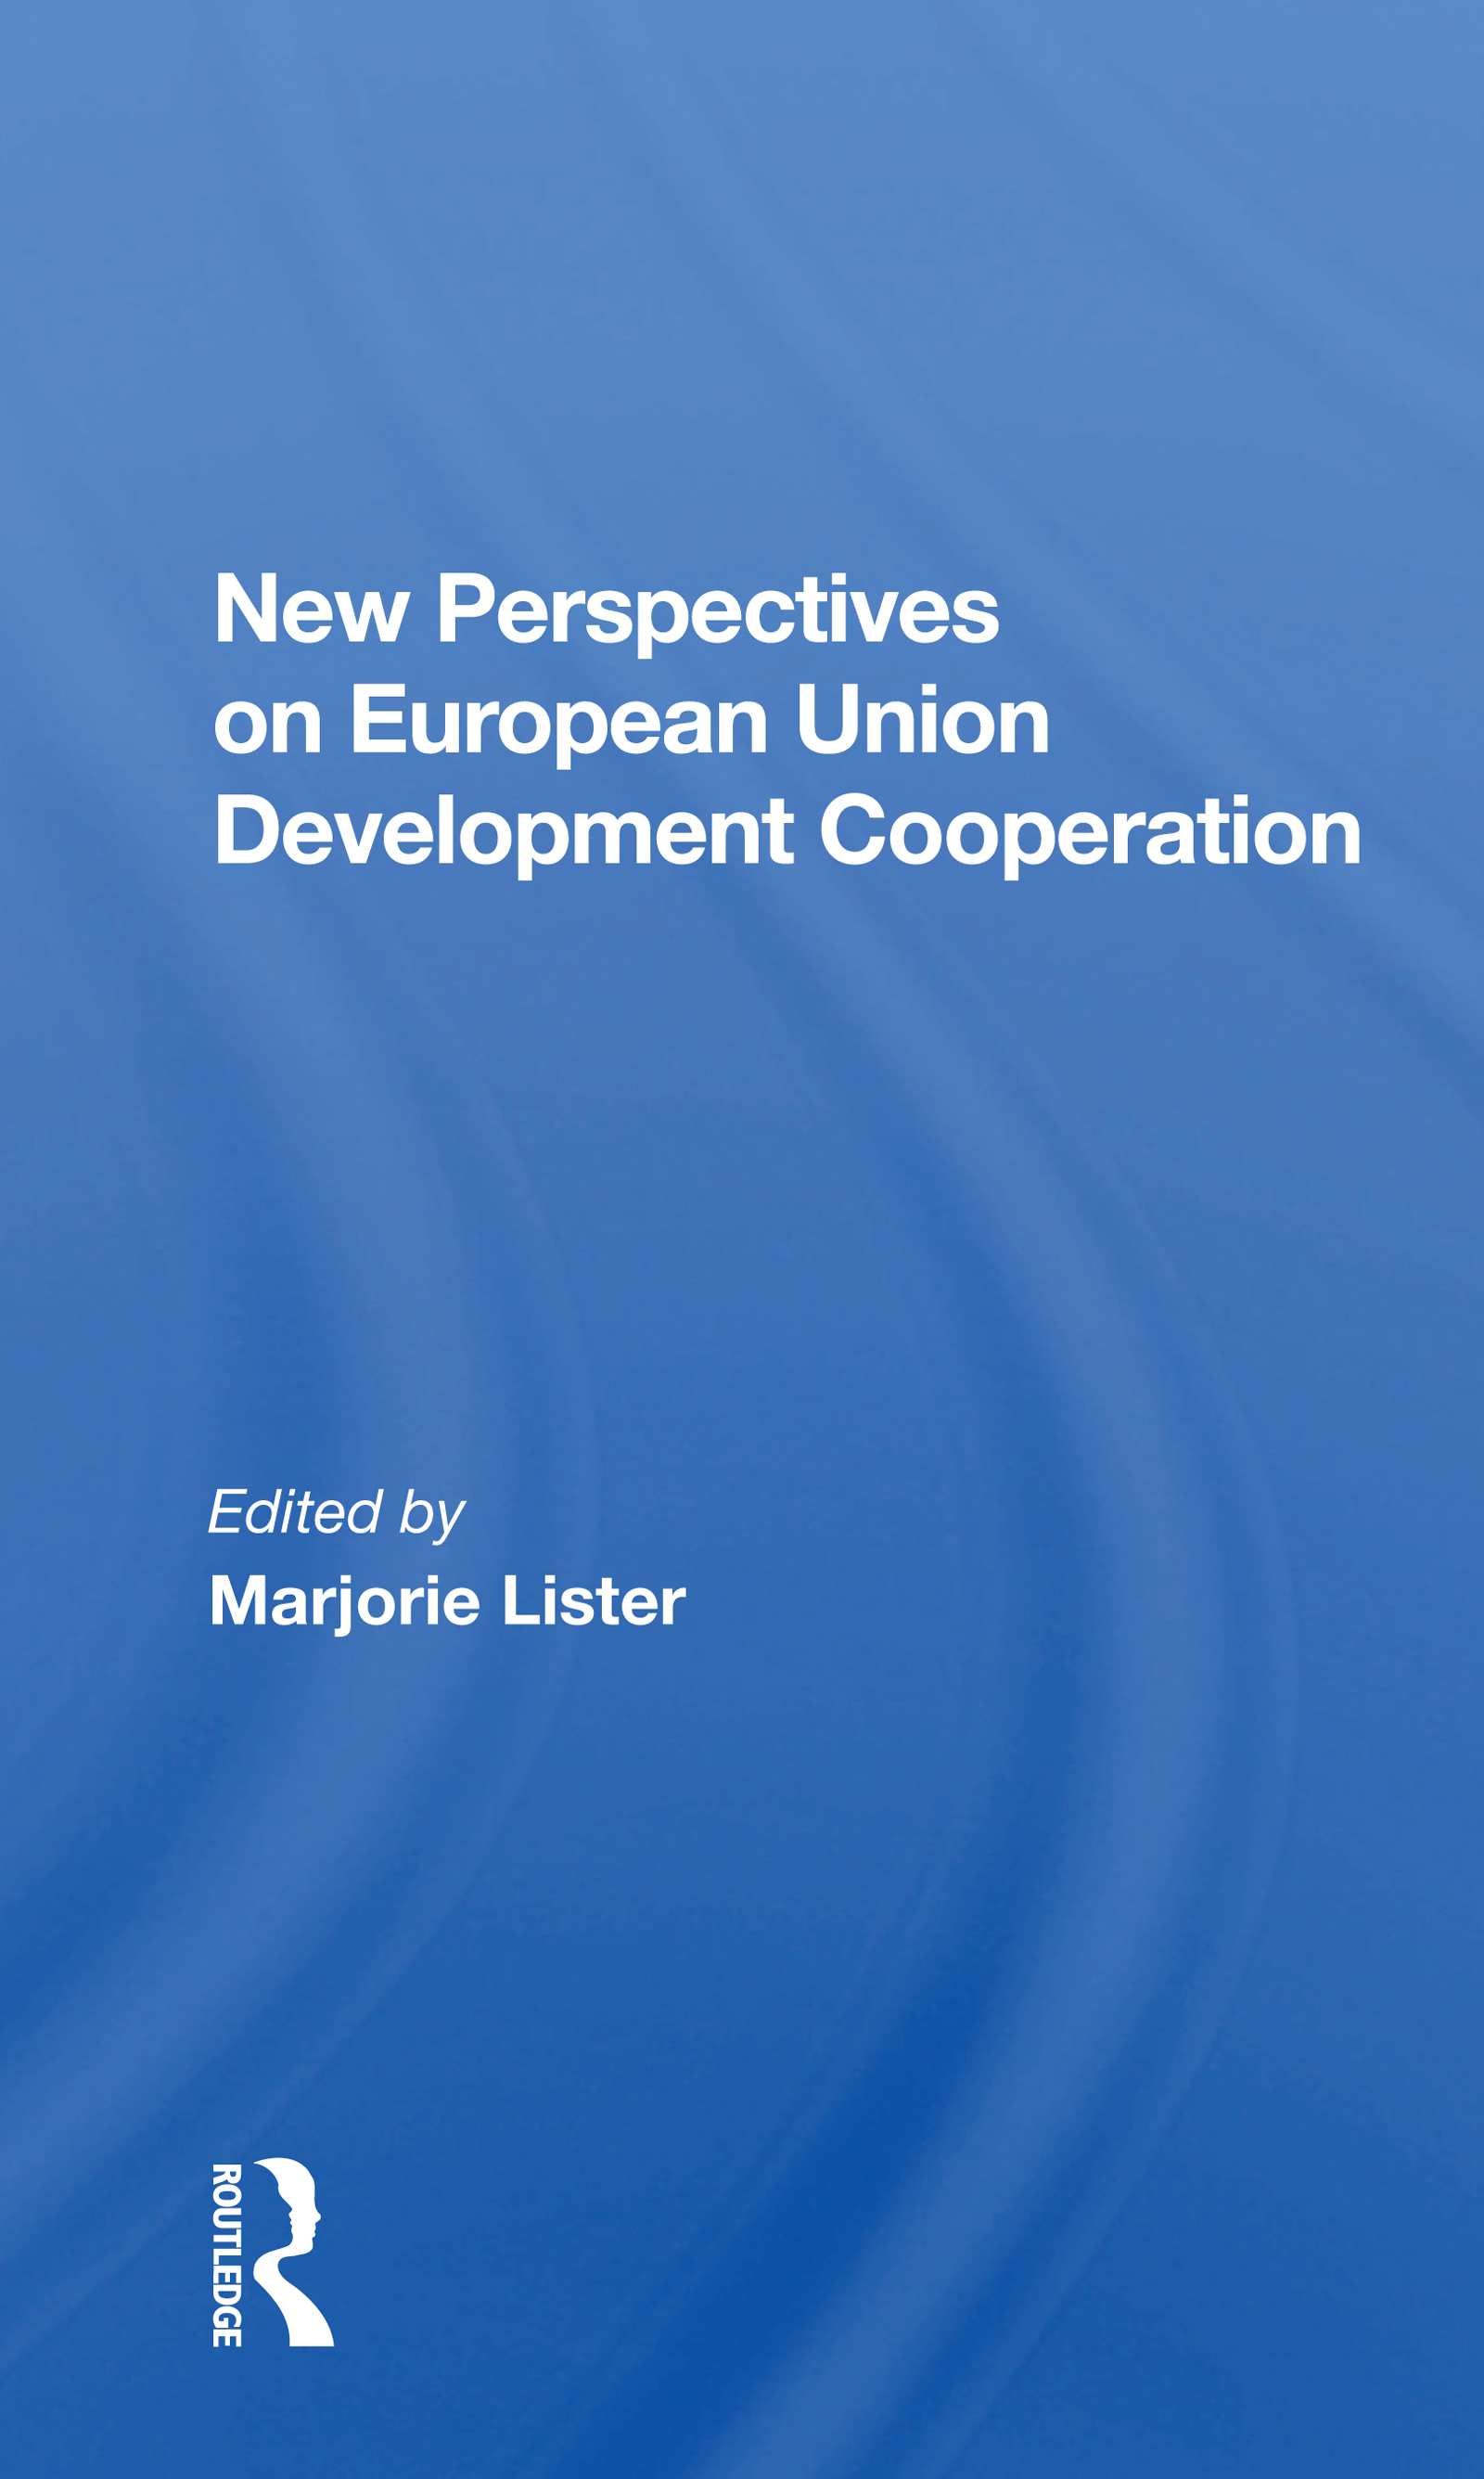 New Perspectives on European Union Development Cooperation